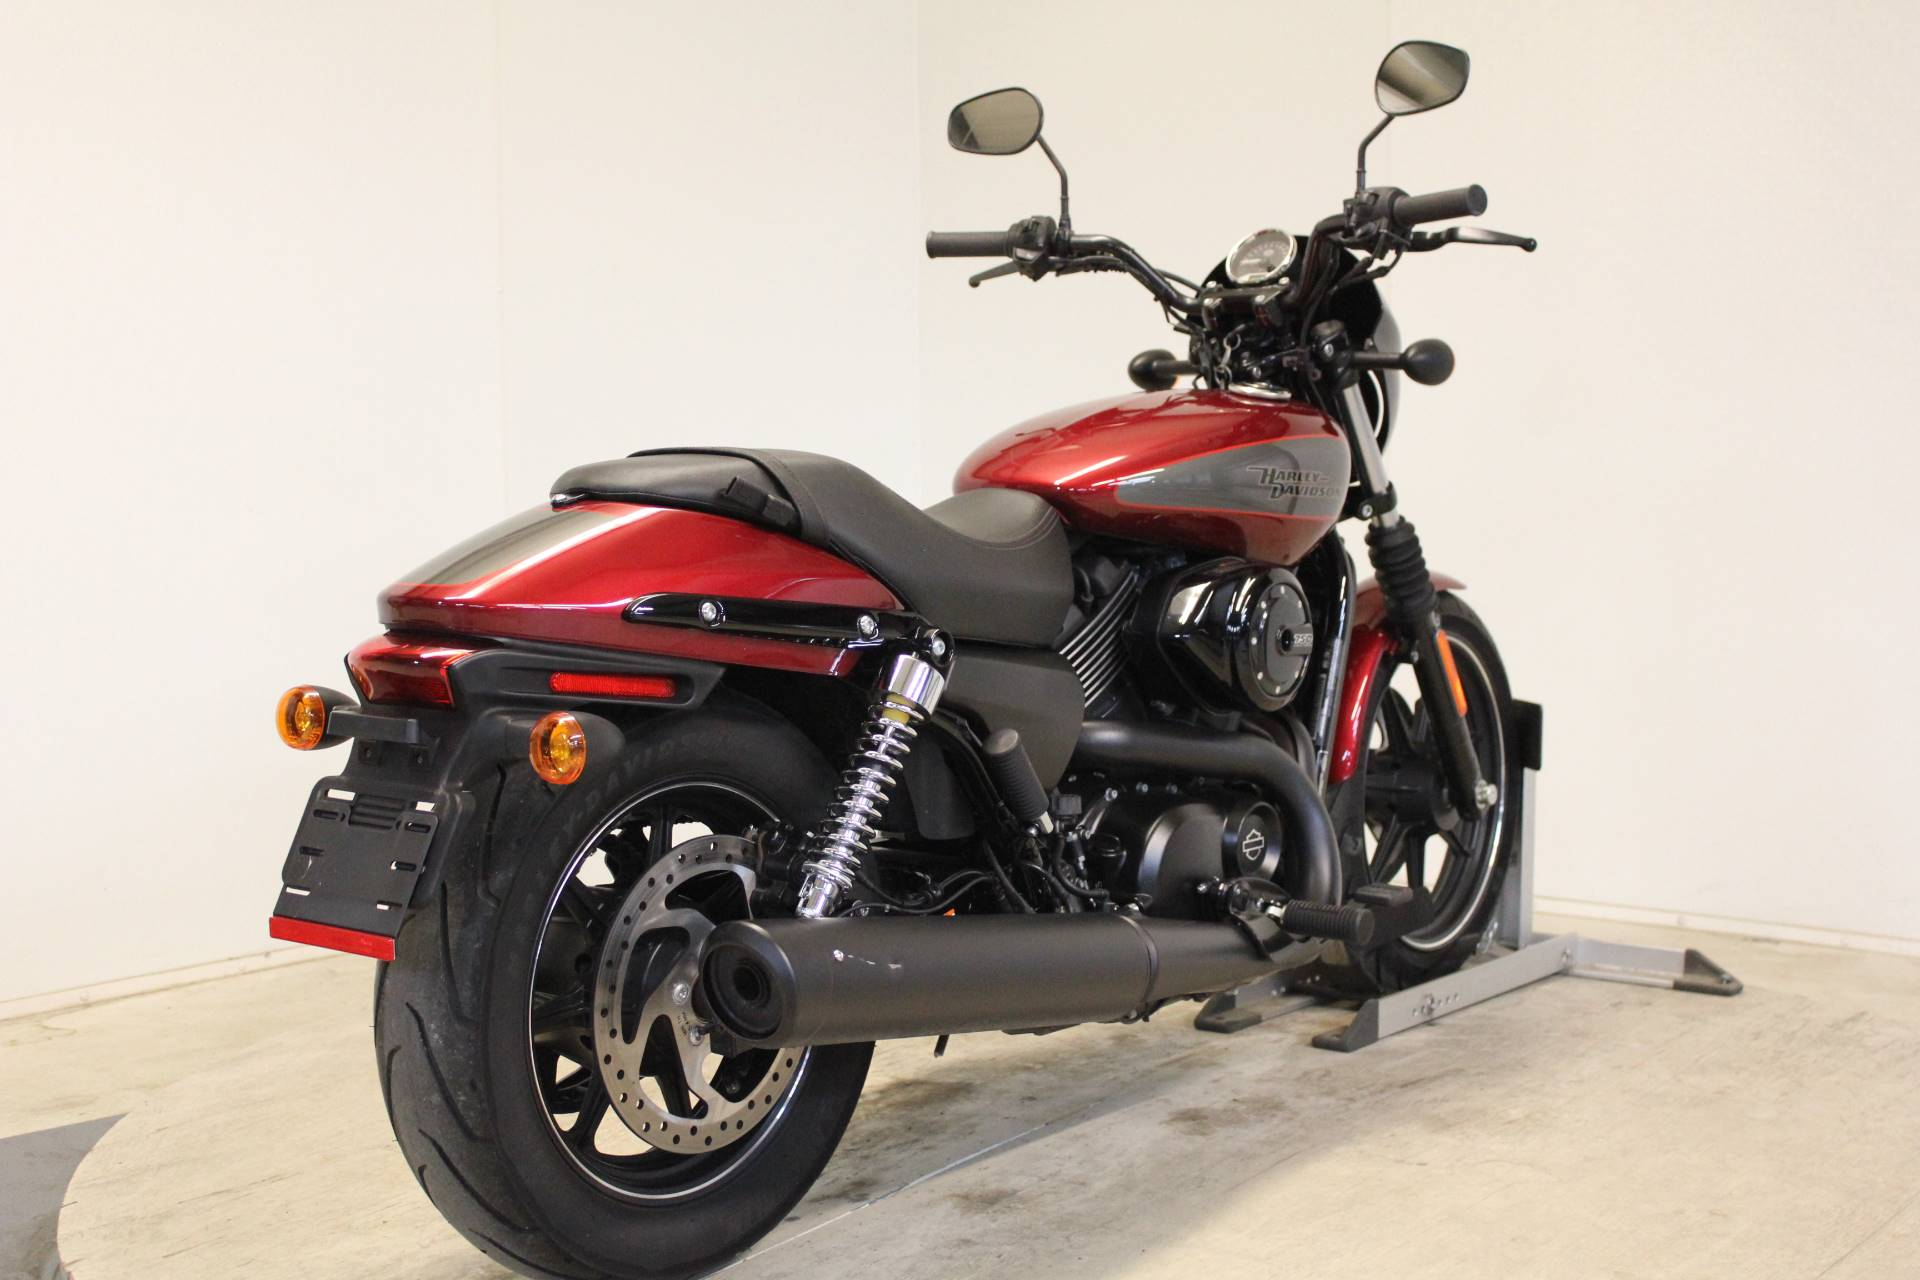 2017 Harley-Davidson Street 750 8